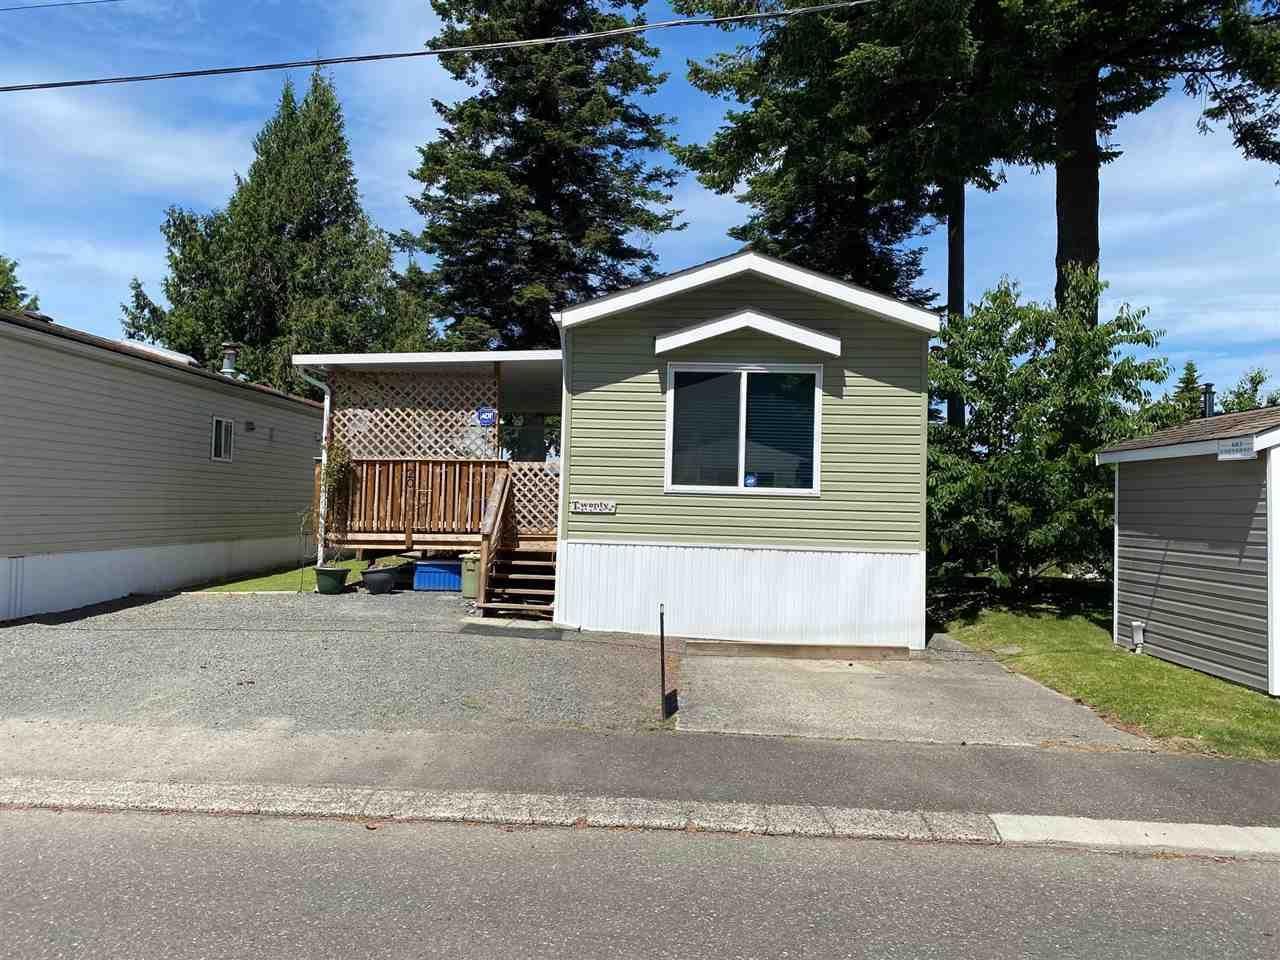 Main Photo: 20 6338 VEDDER Road in Chilliwack: Sardis East Vedder Rd Manufactured Home for sale (Sardis)  : MLS®# R2587375